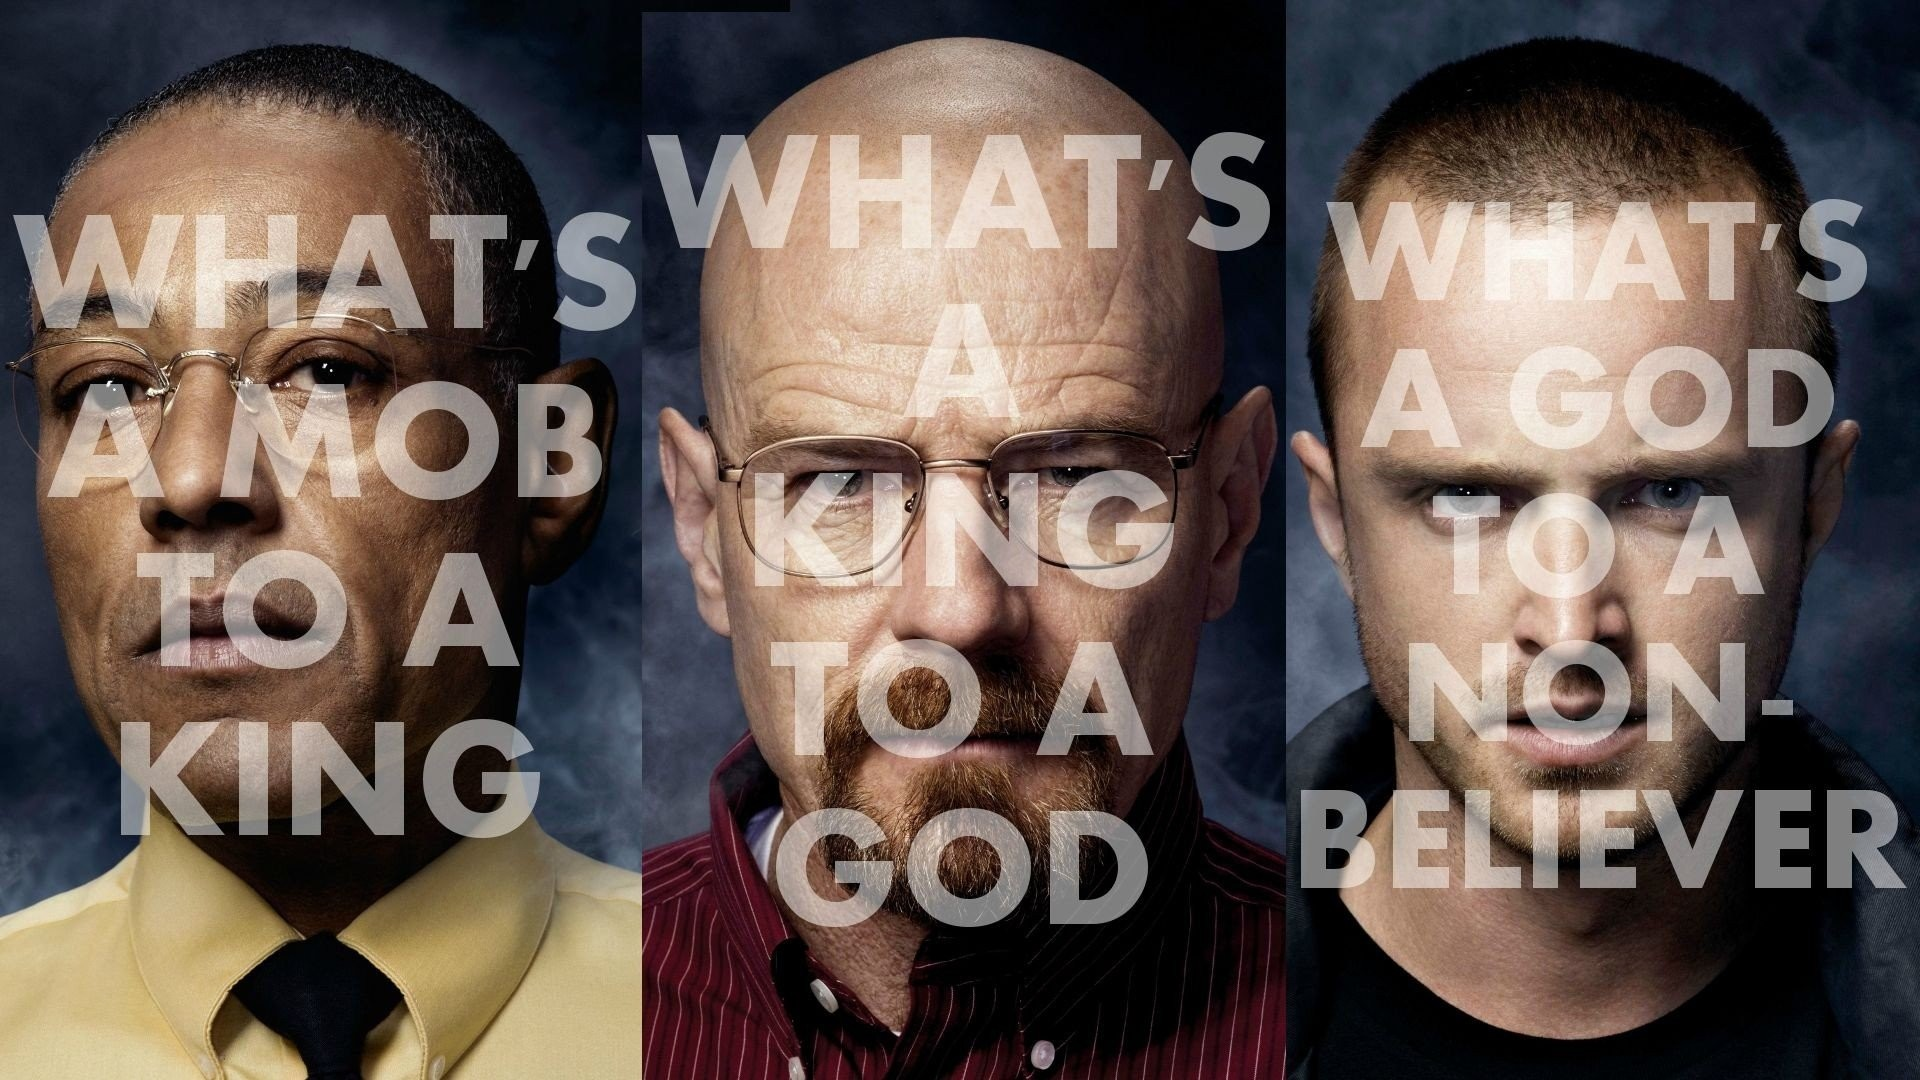 Aaron Paul Breaking Bad Bryan Cranston Frank Ocean Giancarlo Esposito Jay Z  Jesse Pinkman Lyrics Panels Typography Walter White